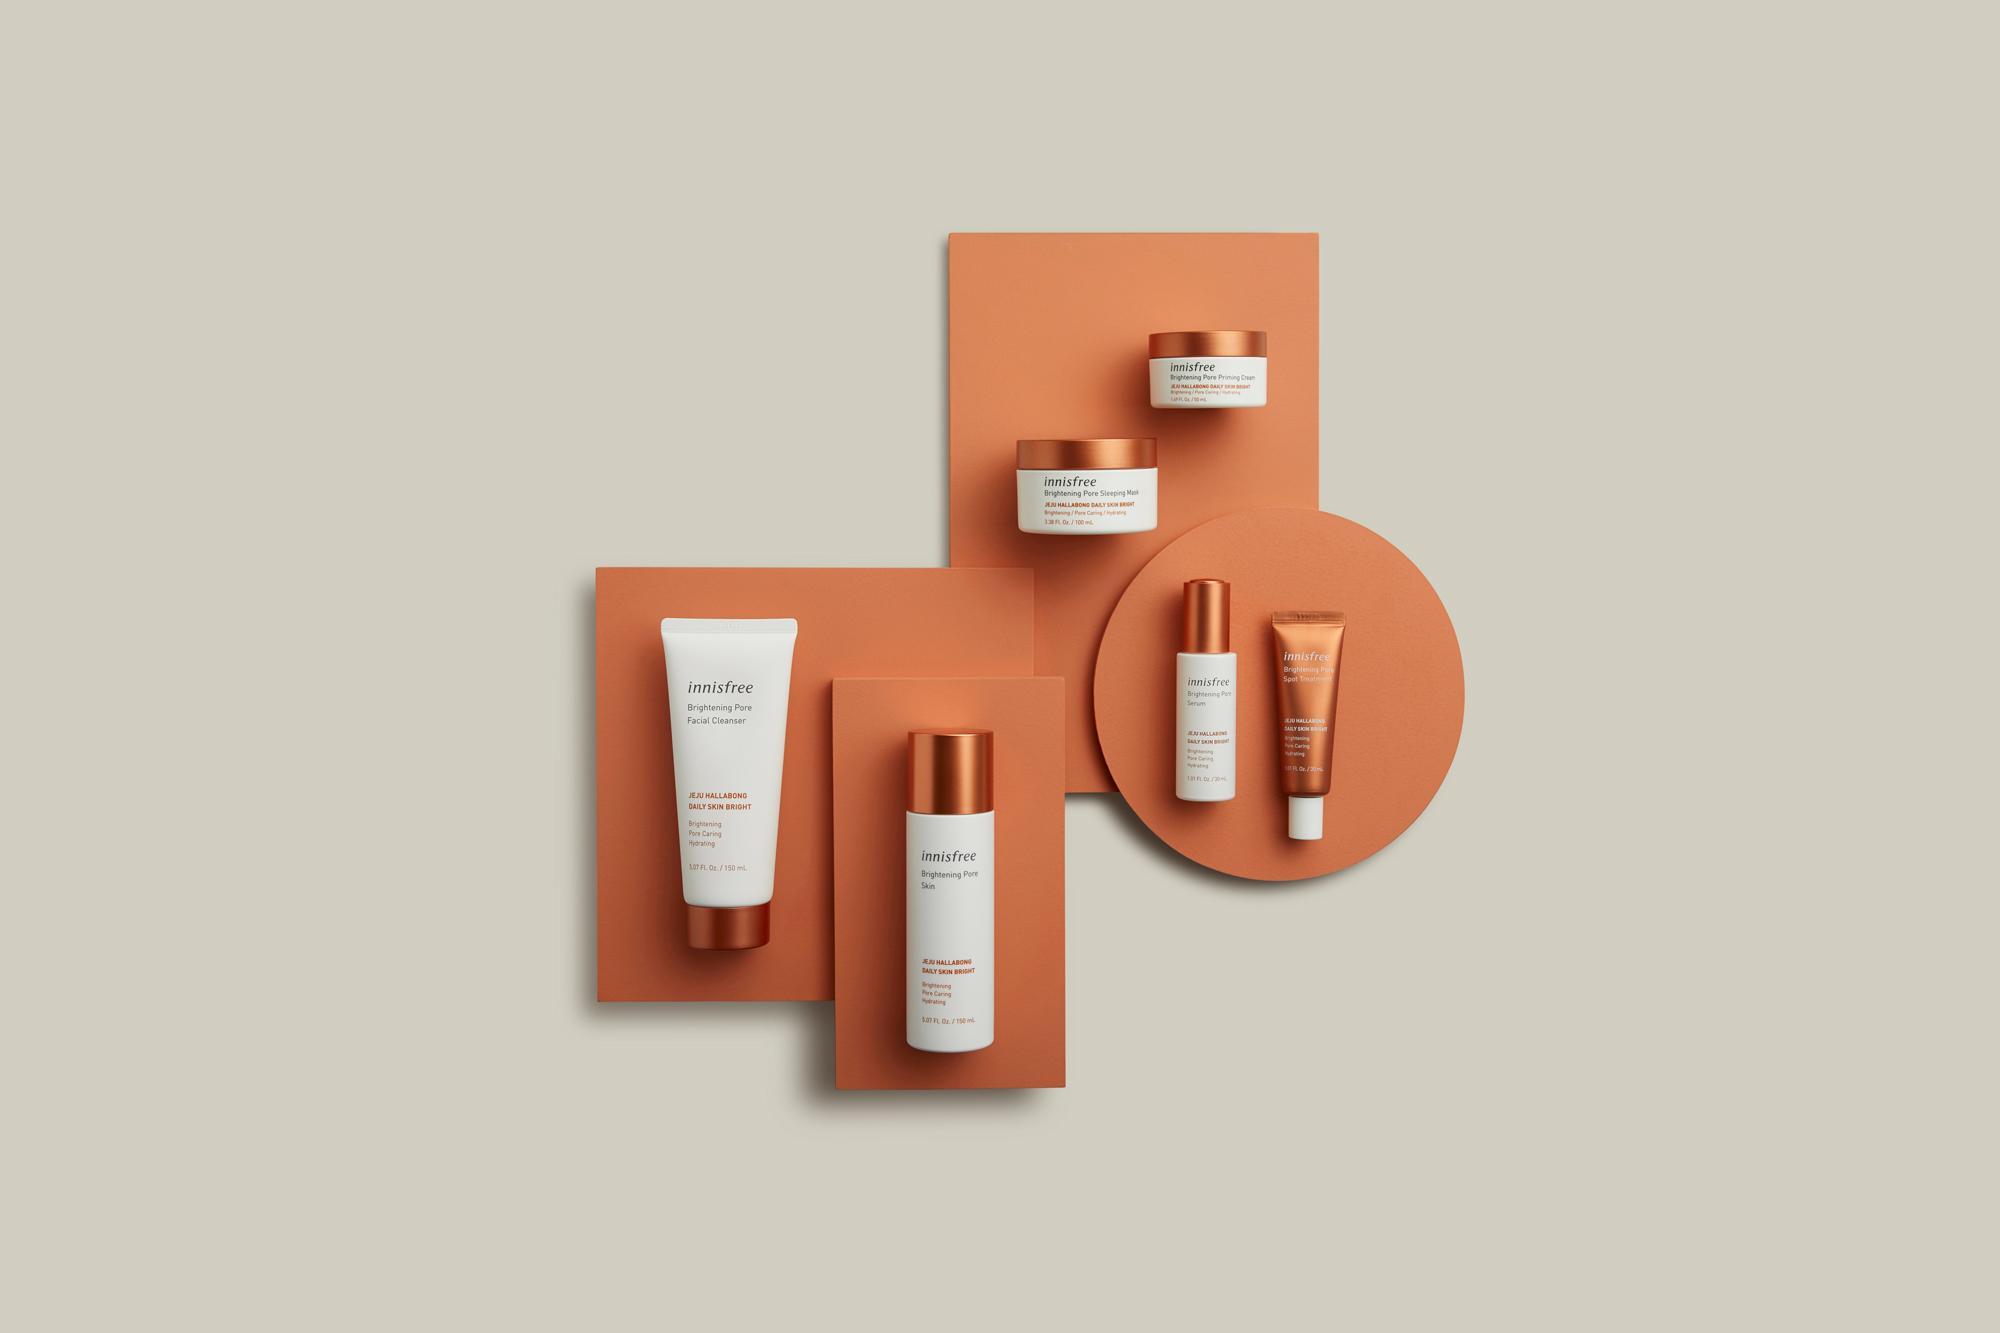 Bộ sản phẩm dưỡng da innisfree Brightening Pore